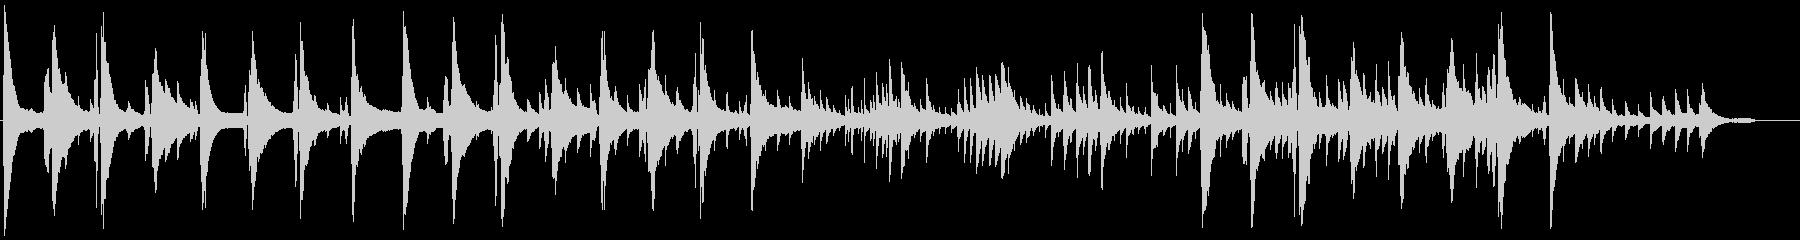 Moist and heartwarming BGM1's unreproduced waveform